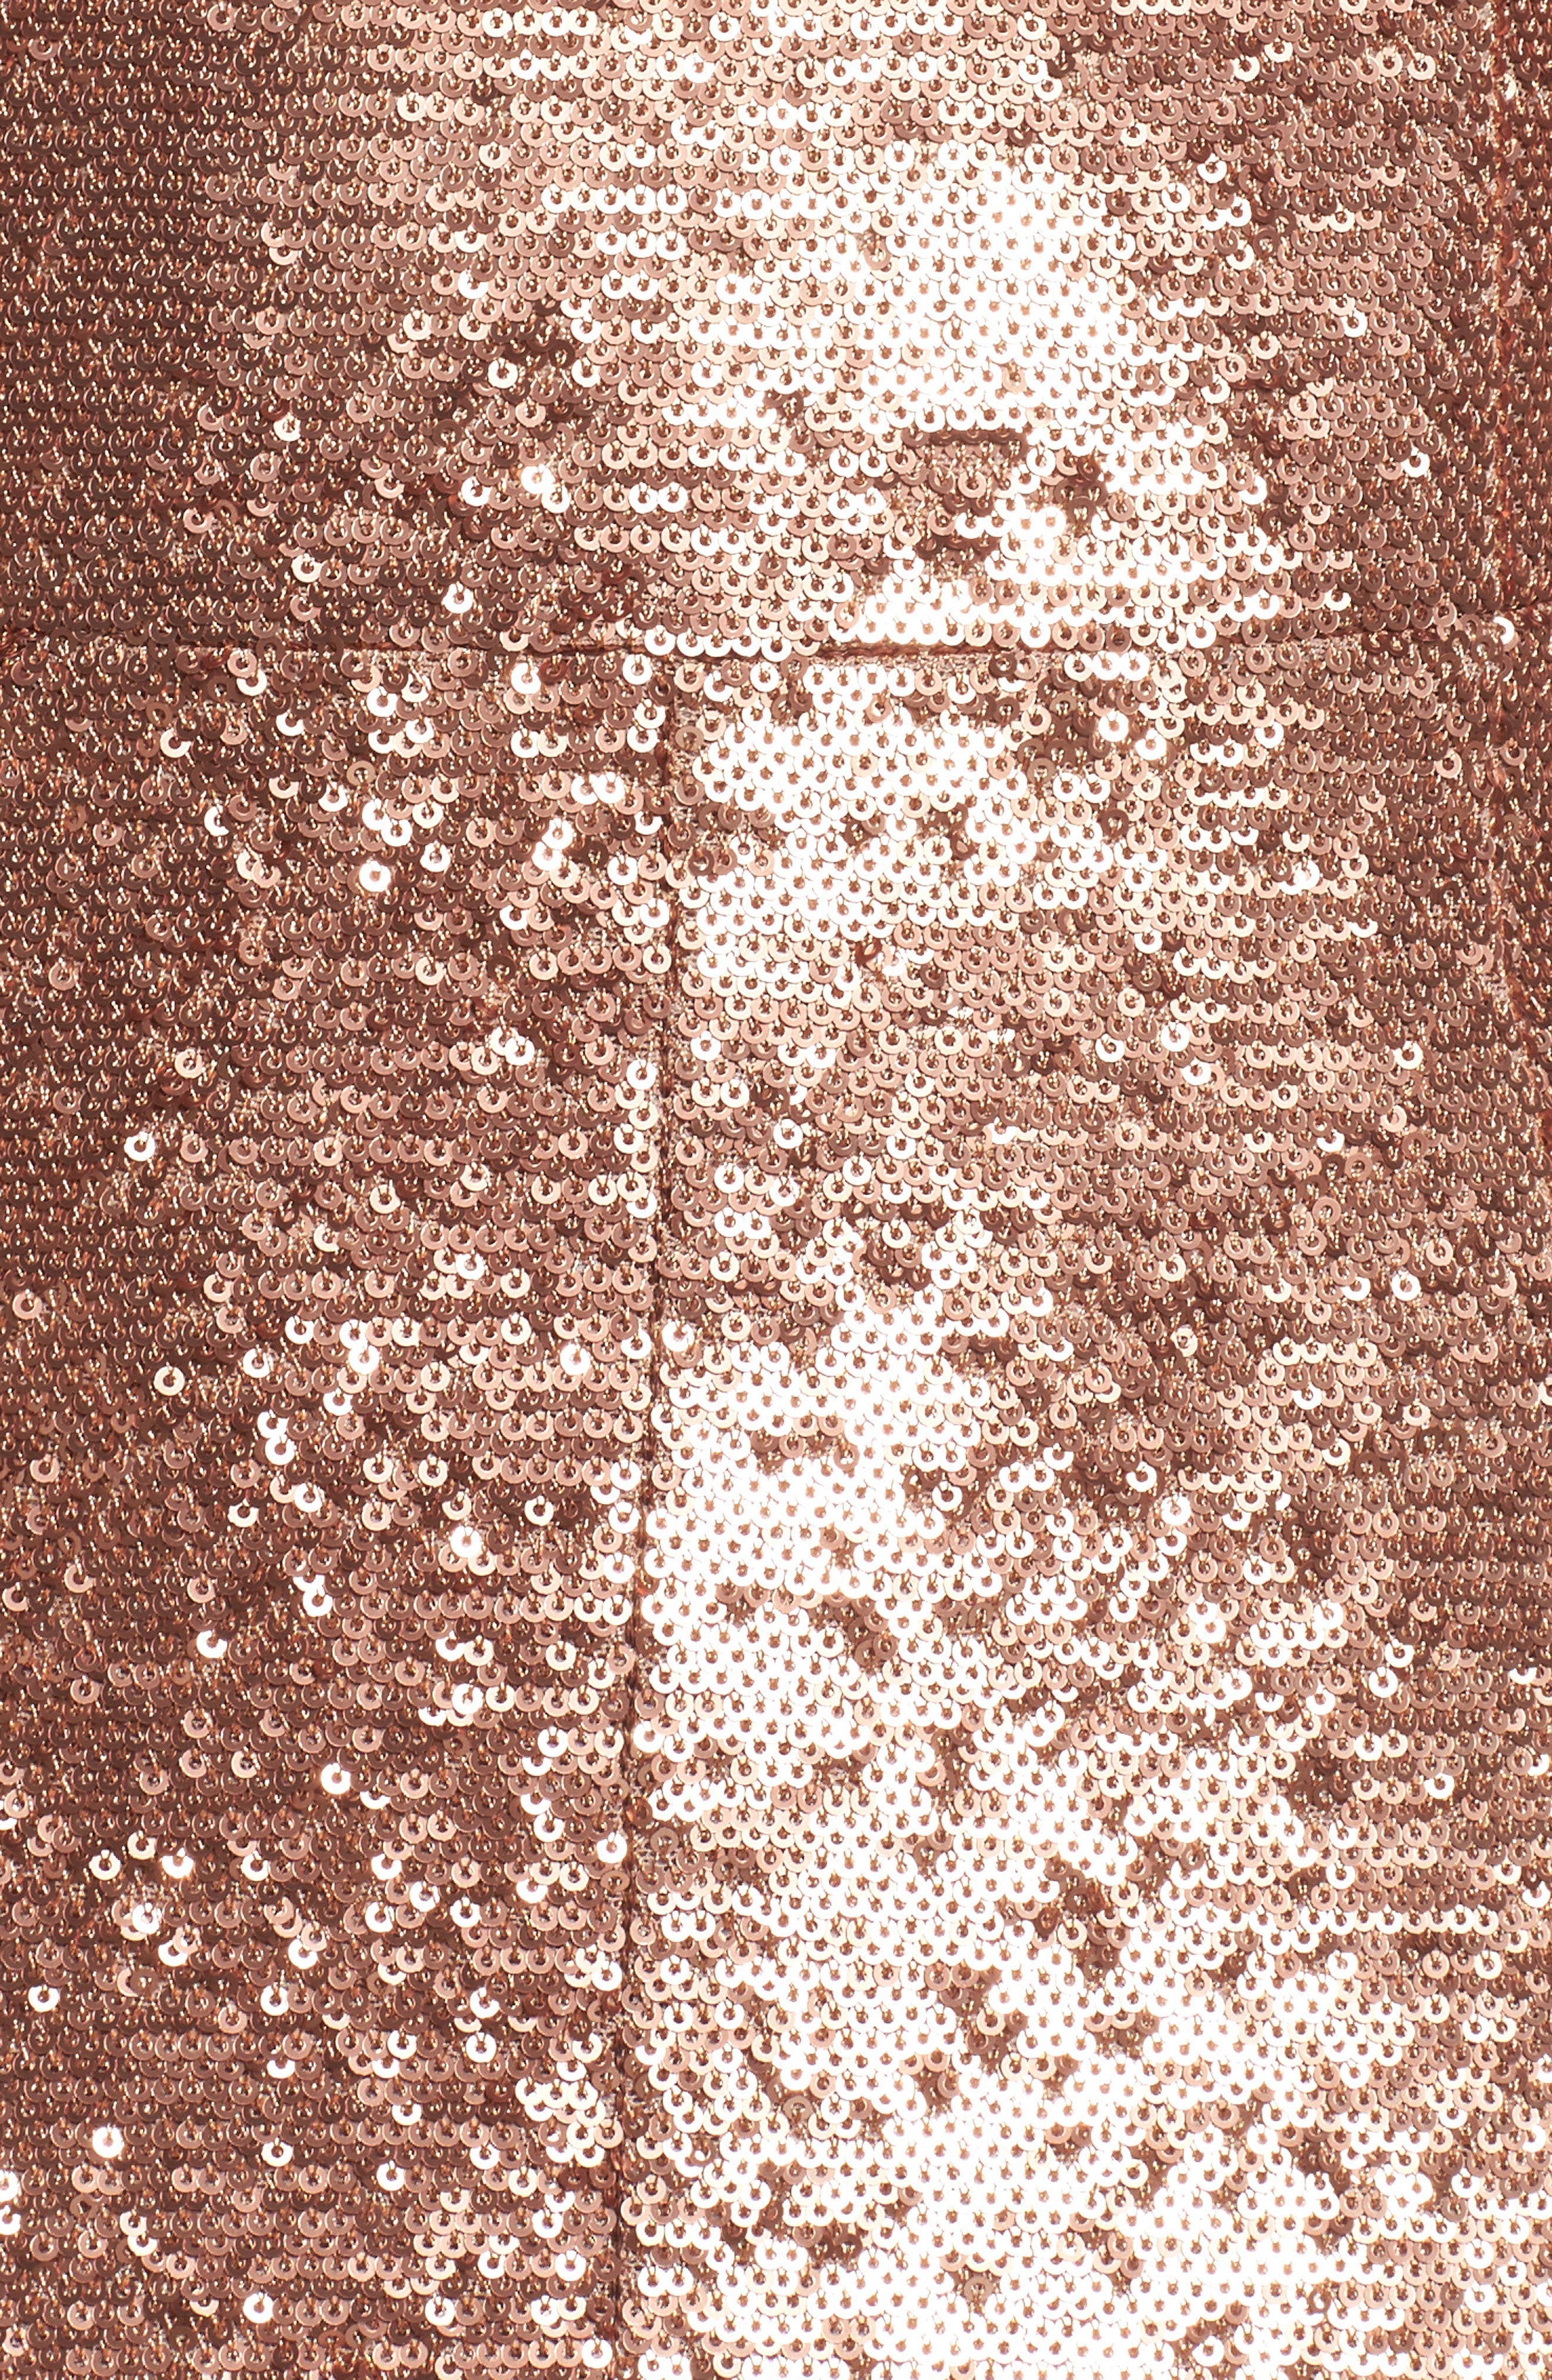 Illuminated Sequin Ruffle Midi Dress,                             Alternate thumbnail 6, color,                             Copper